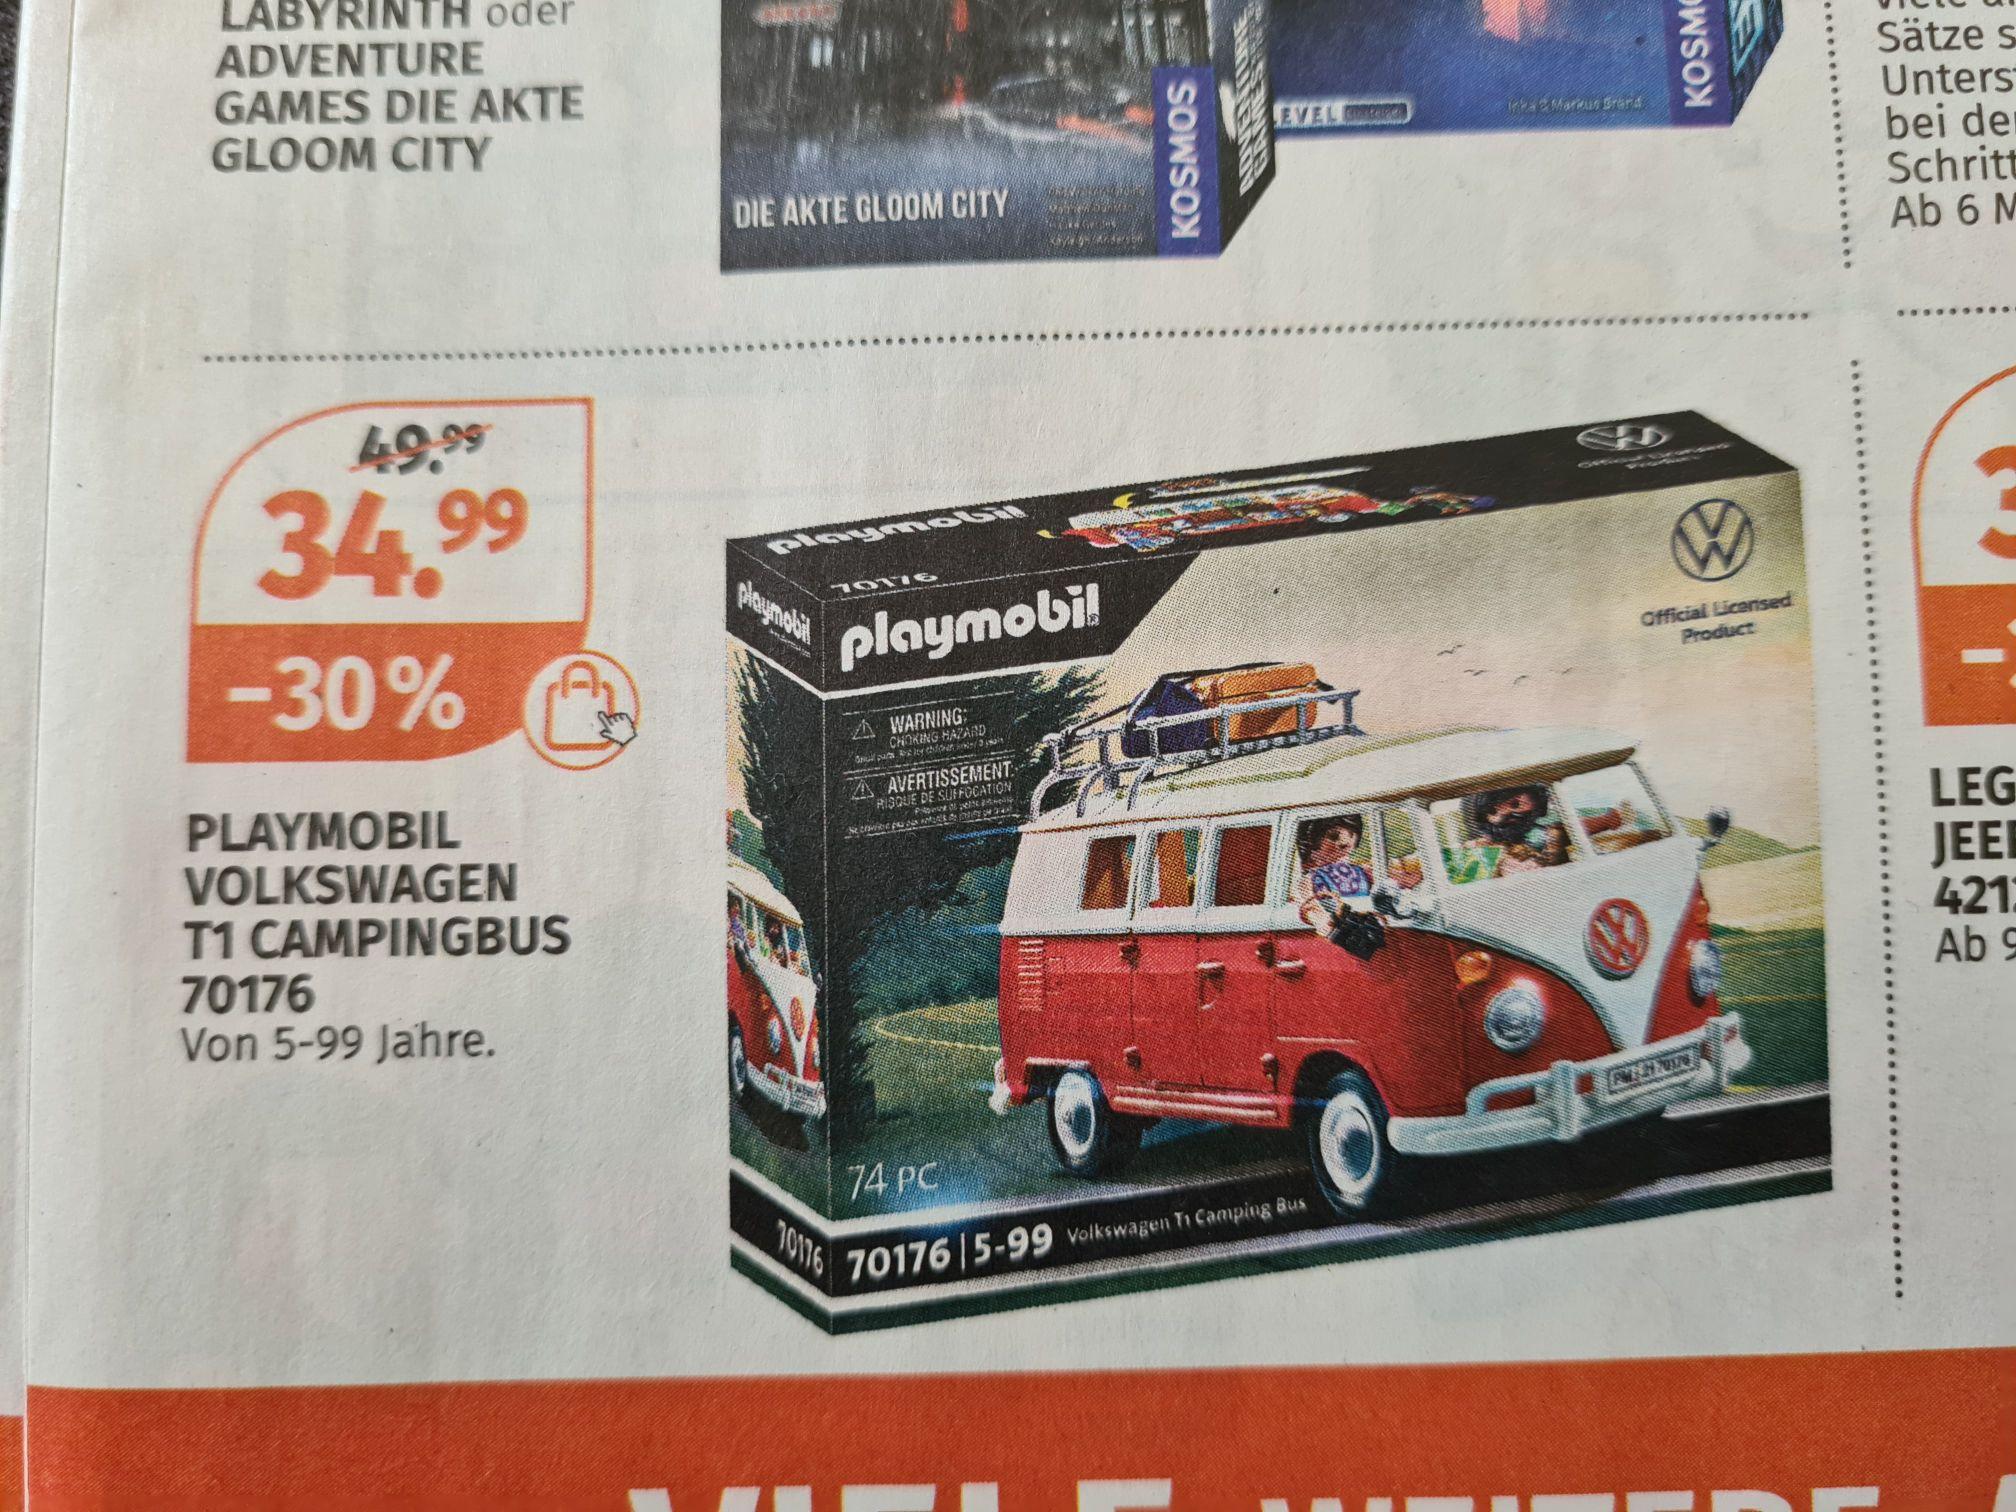 Playmobil Volkswagen T1 Campingbus 70176 (Müller)